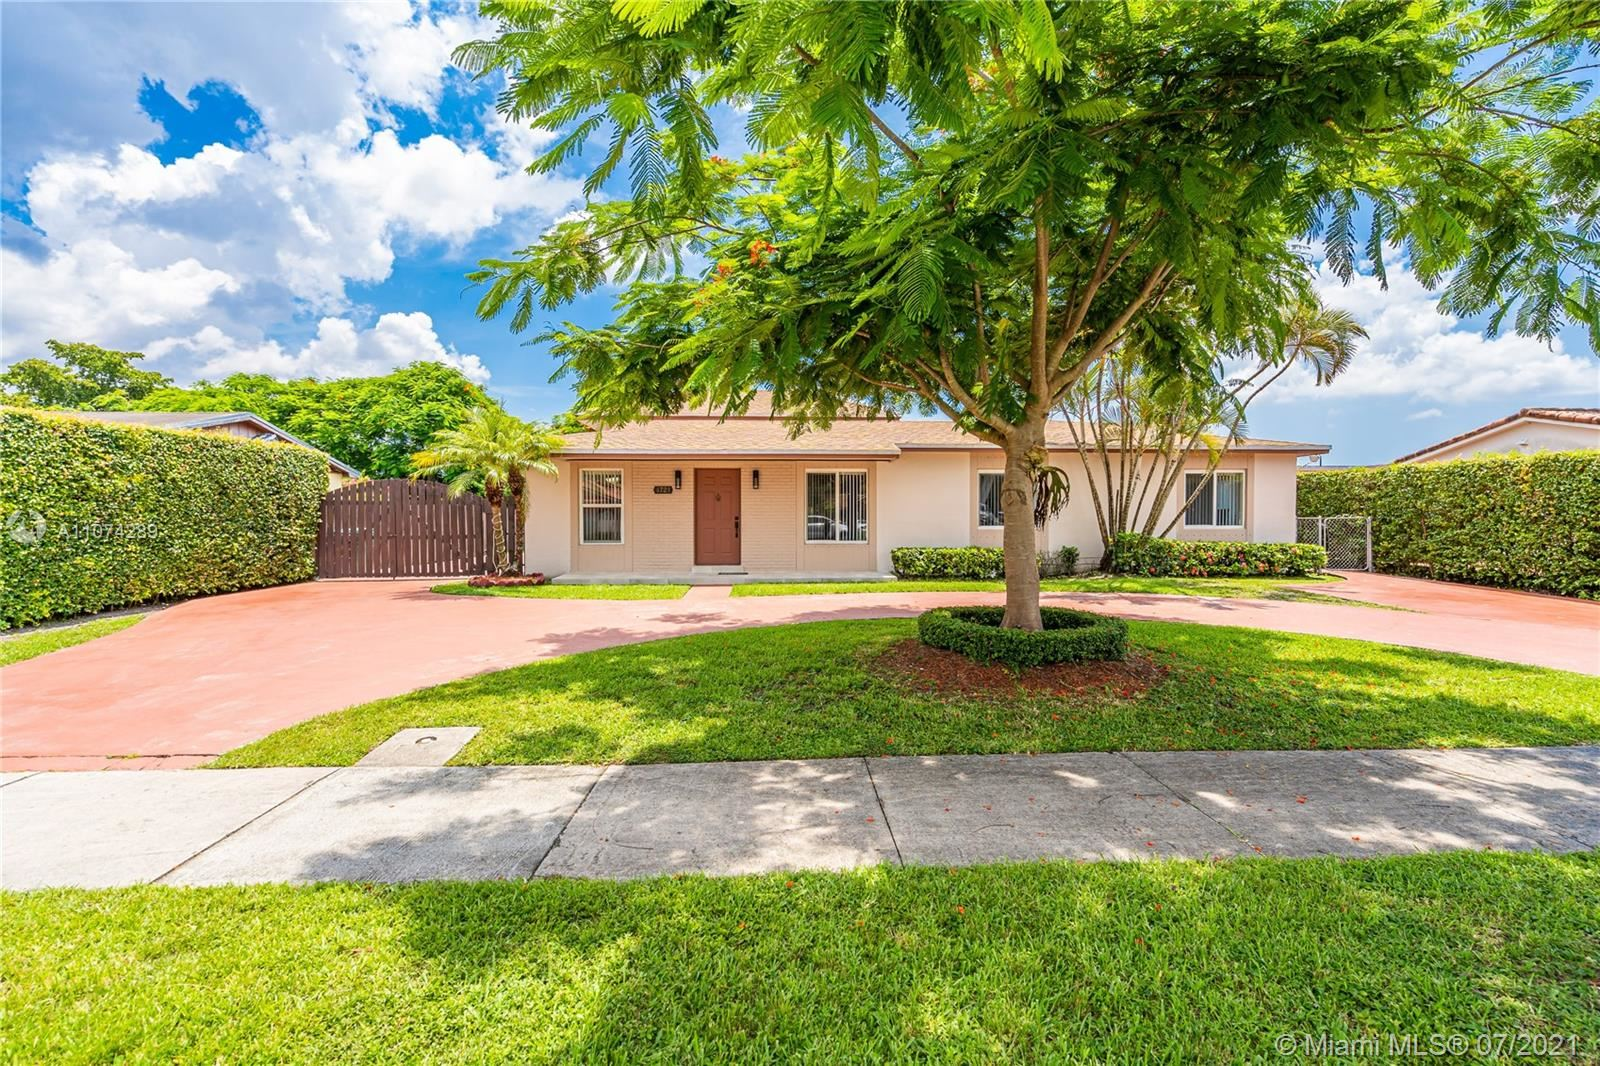 4721 SW 132nd Ave, Miami, FL 33175 - #: A11074289